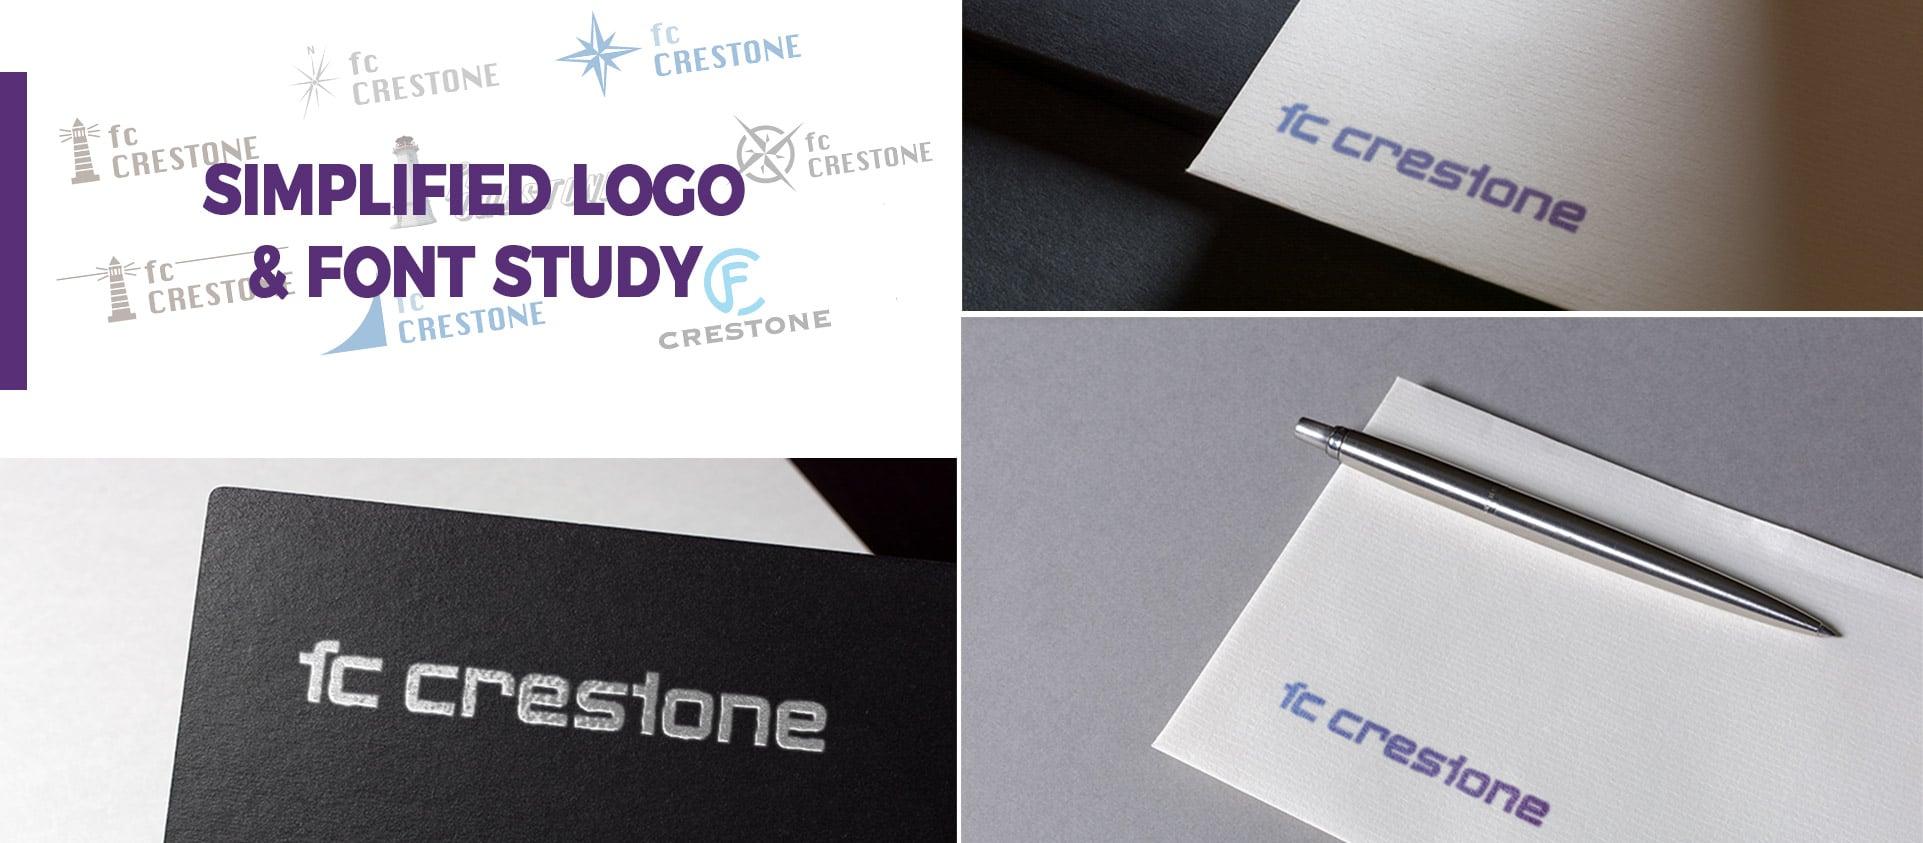 fc crestone branding